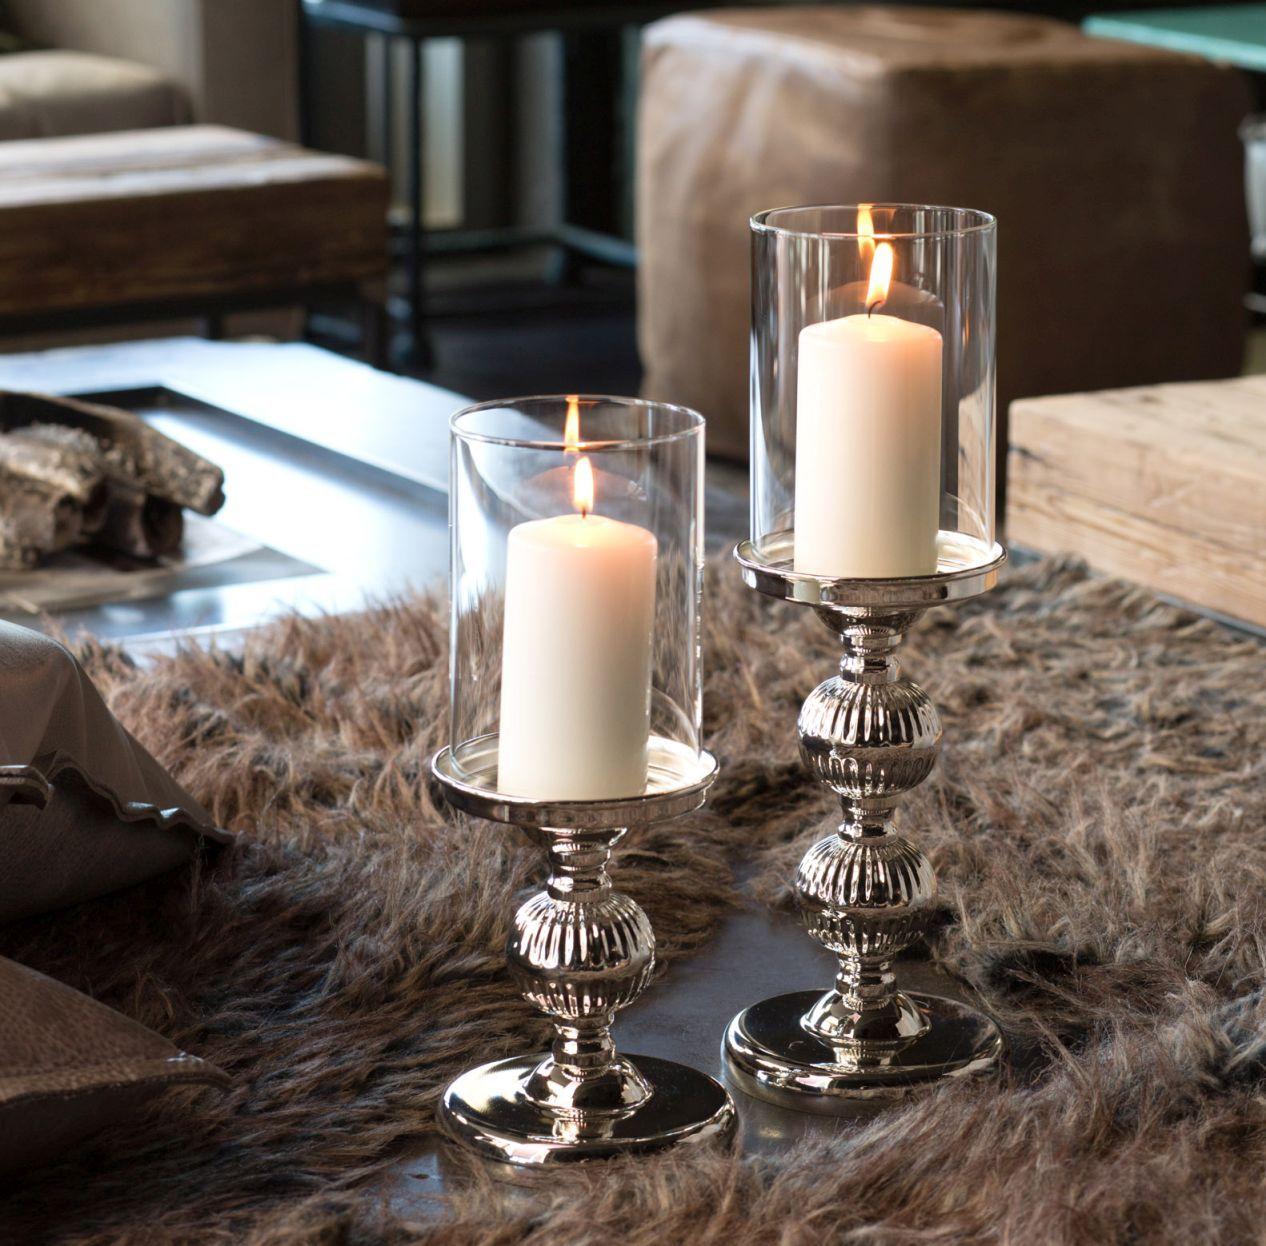 Windlicht kerzenhalter versilbert bezahlbarer luxus in silber deko - Luxus wohnaccessoires ...